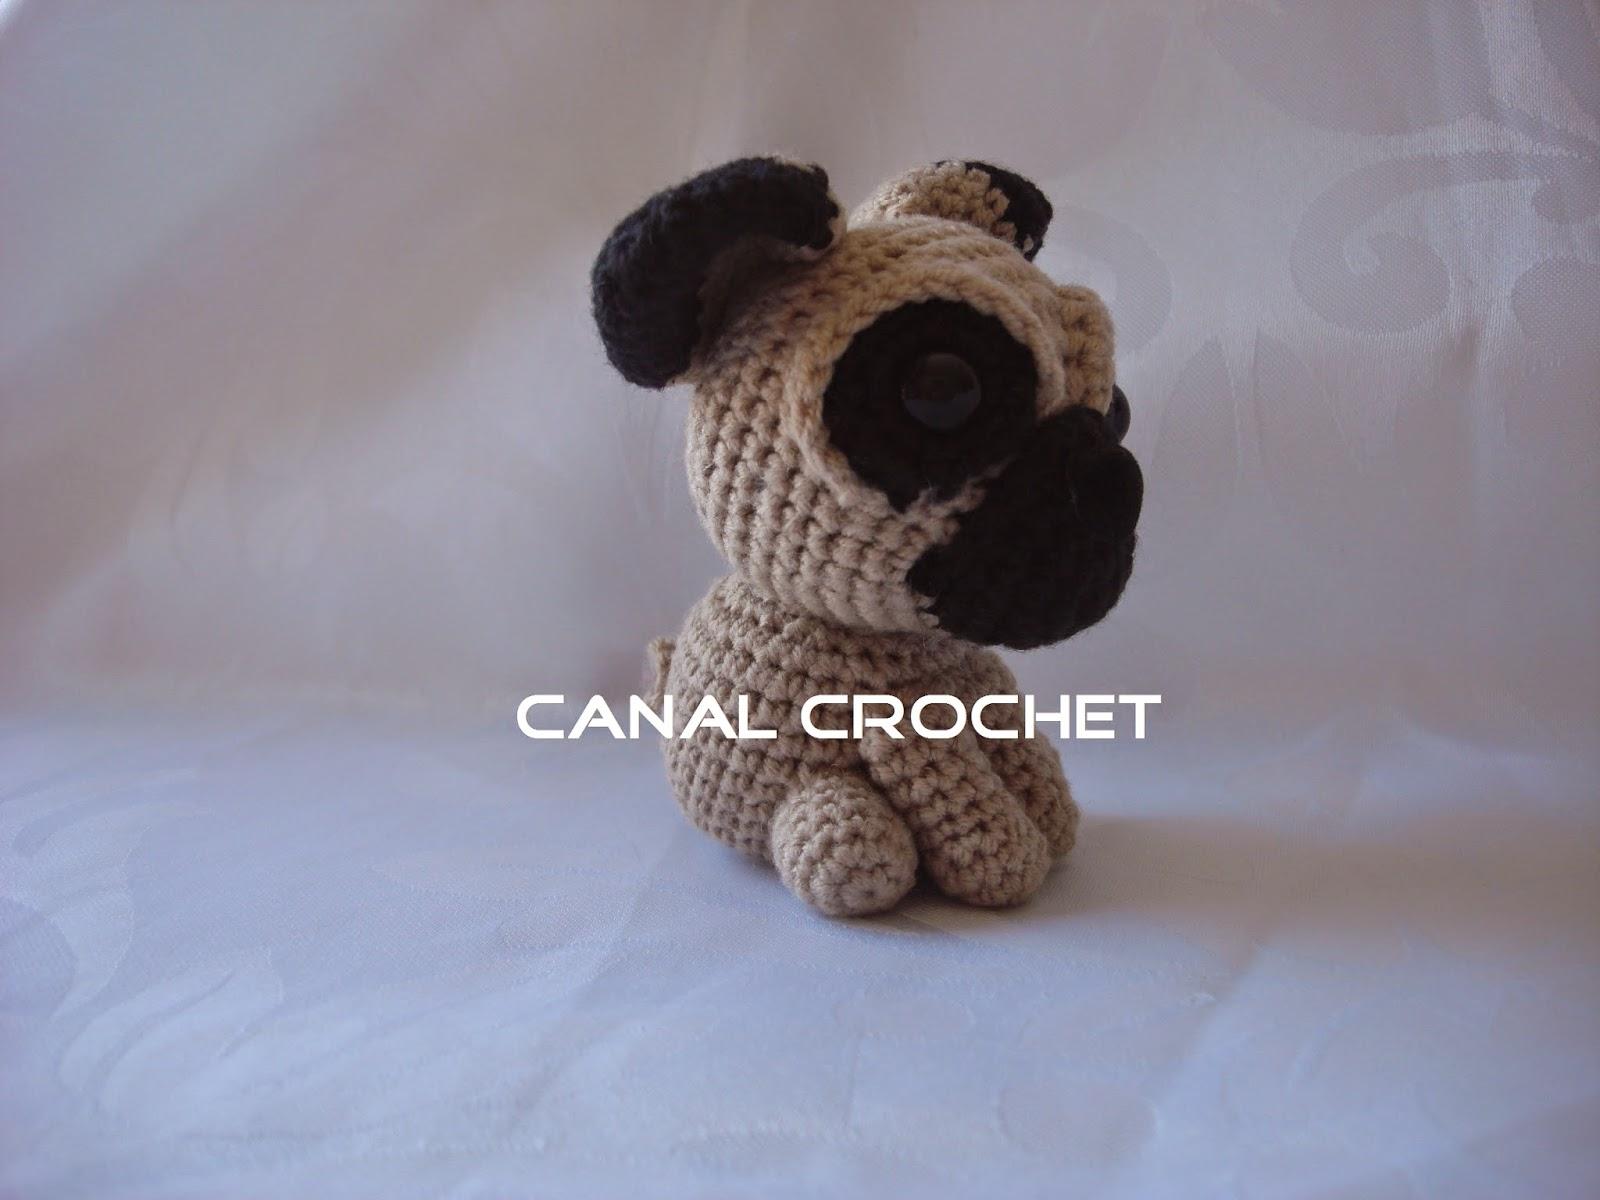 Crochet Adorable Pug Amigurumi Dog Part 1 of 2 DIY Tutorial - YouTube | 1200x1600